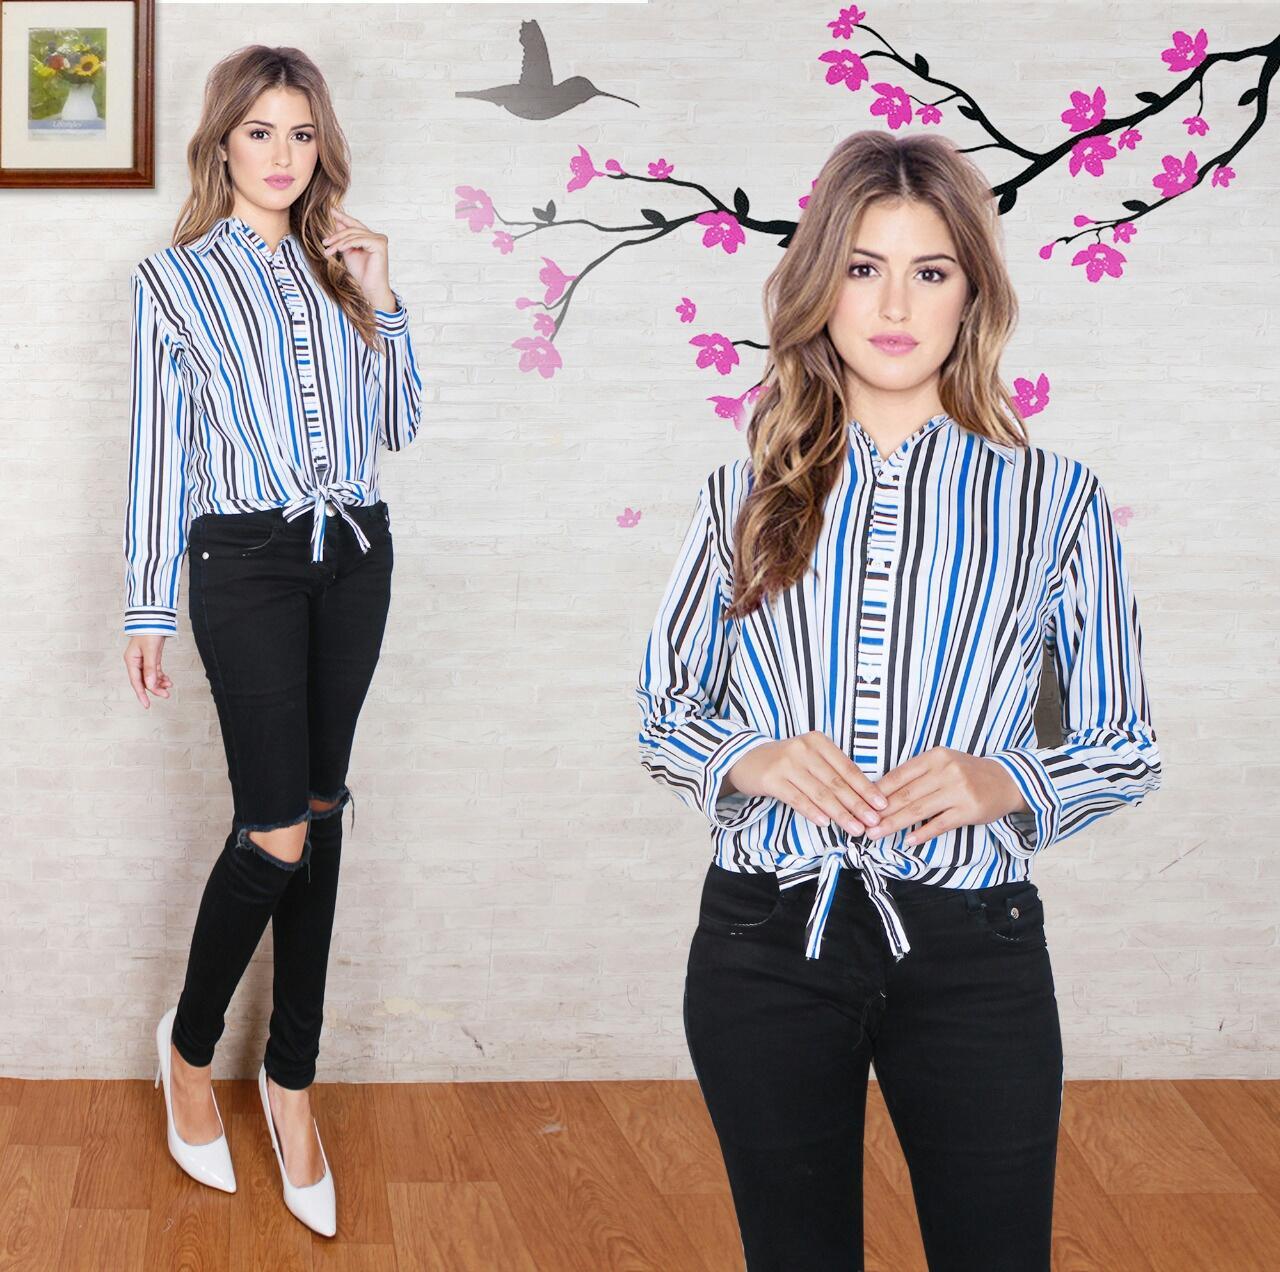 Baju Wanita Shop Kemeja Blouse Meri Lengan Panjang/ Blouse Salur Polos Cewek / Hem Kemeja Baju Wanita Fashion Bangkok / Blus Korean Style / Blouse Wanita Modern NS (rryme) - Biru